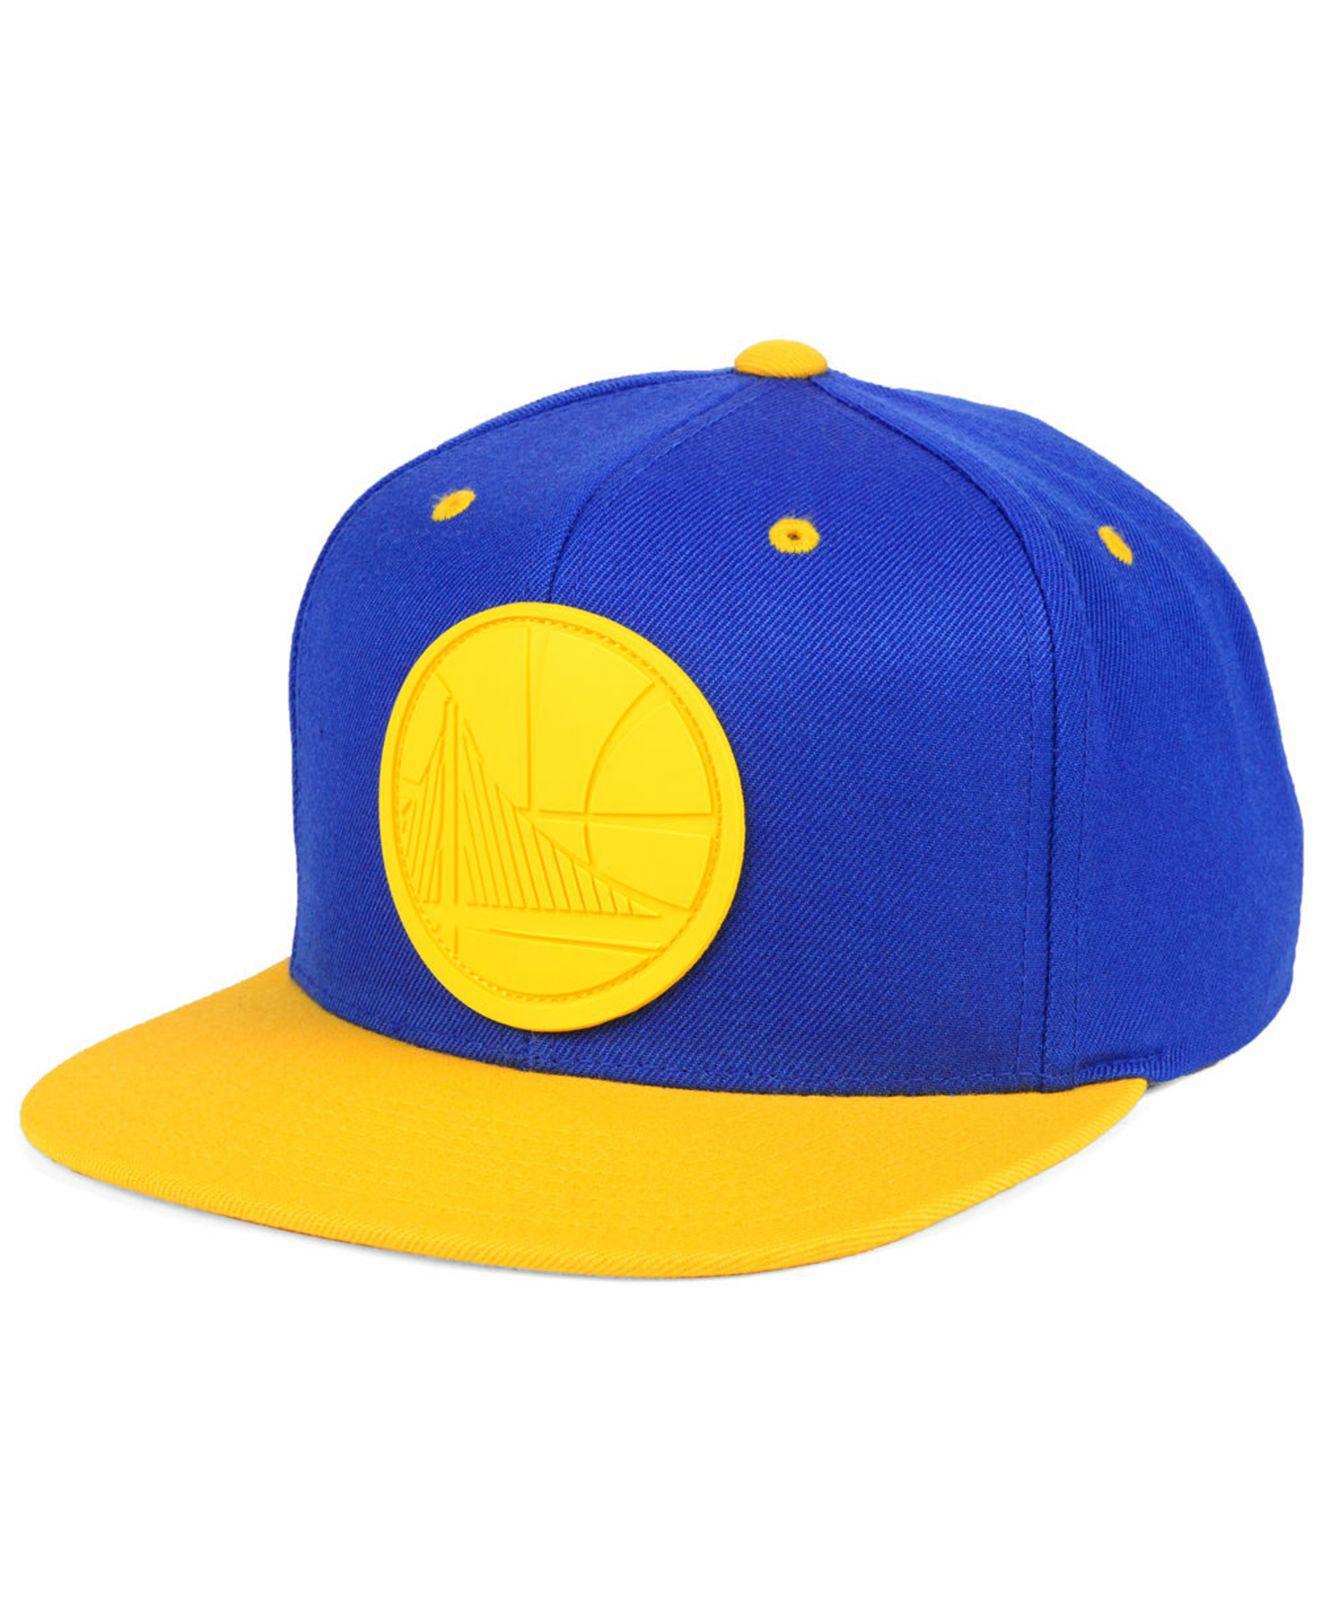 410b1f621c9 Mitchell   Ness. Men s Blue Golden State Warriors Rubber Weld Snapback Cap